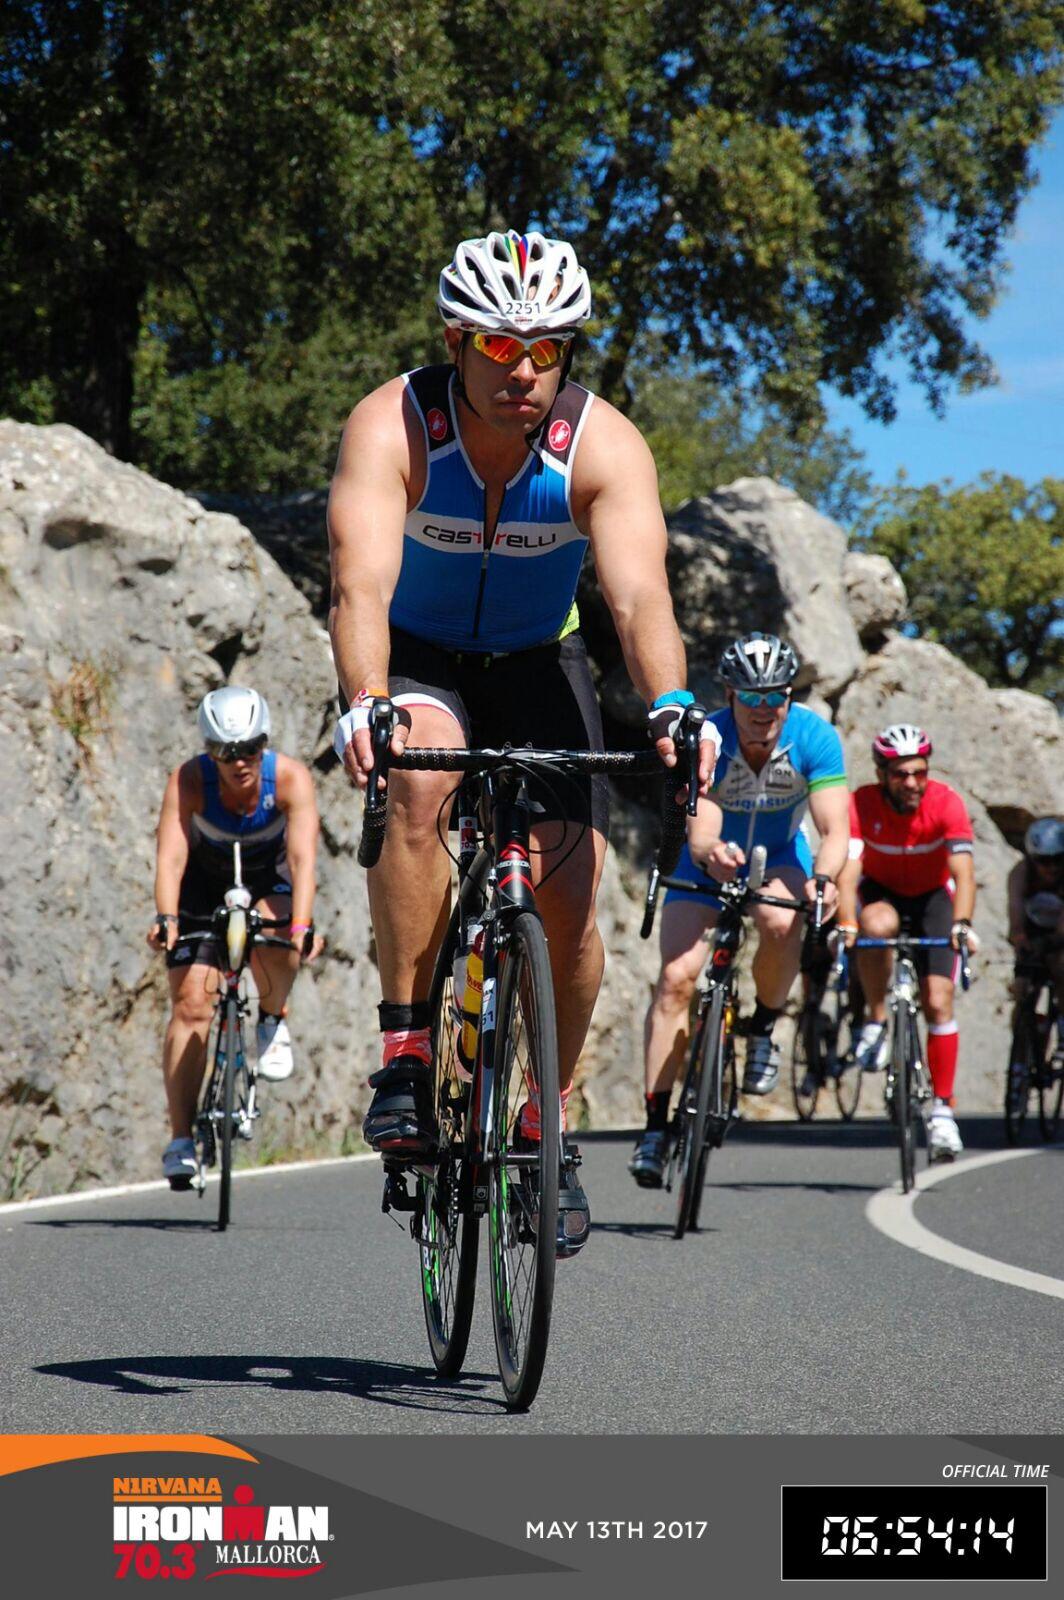 Nirvana Ironman 70.3 Mallorca | Marcos cumple su reto